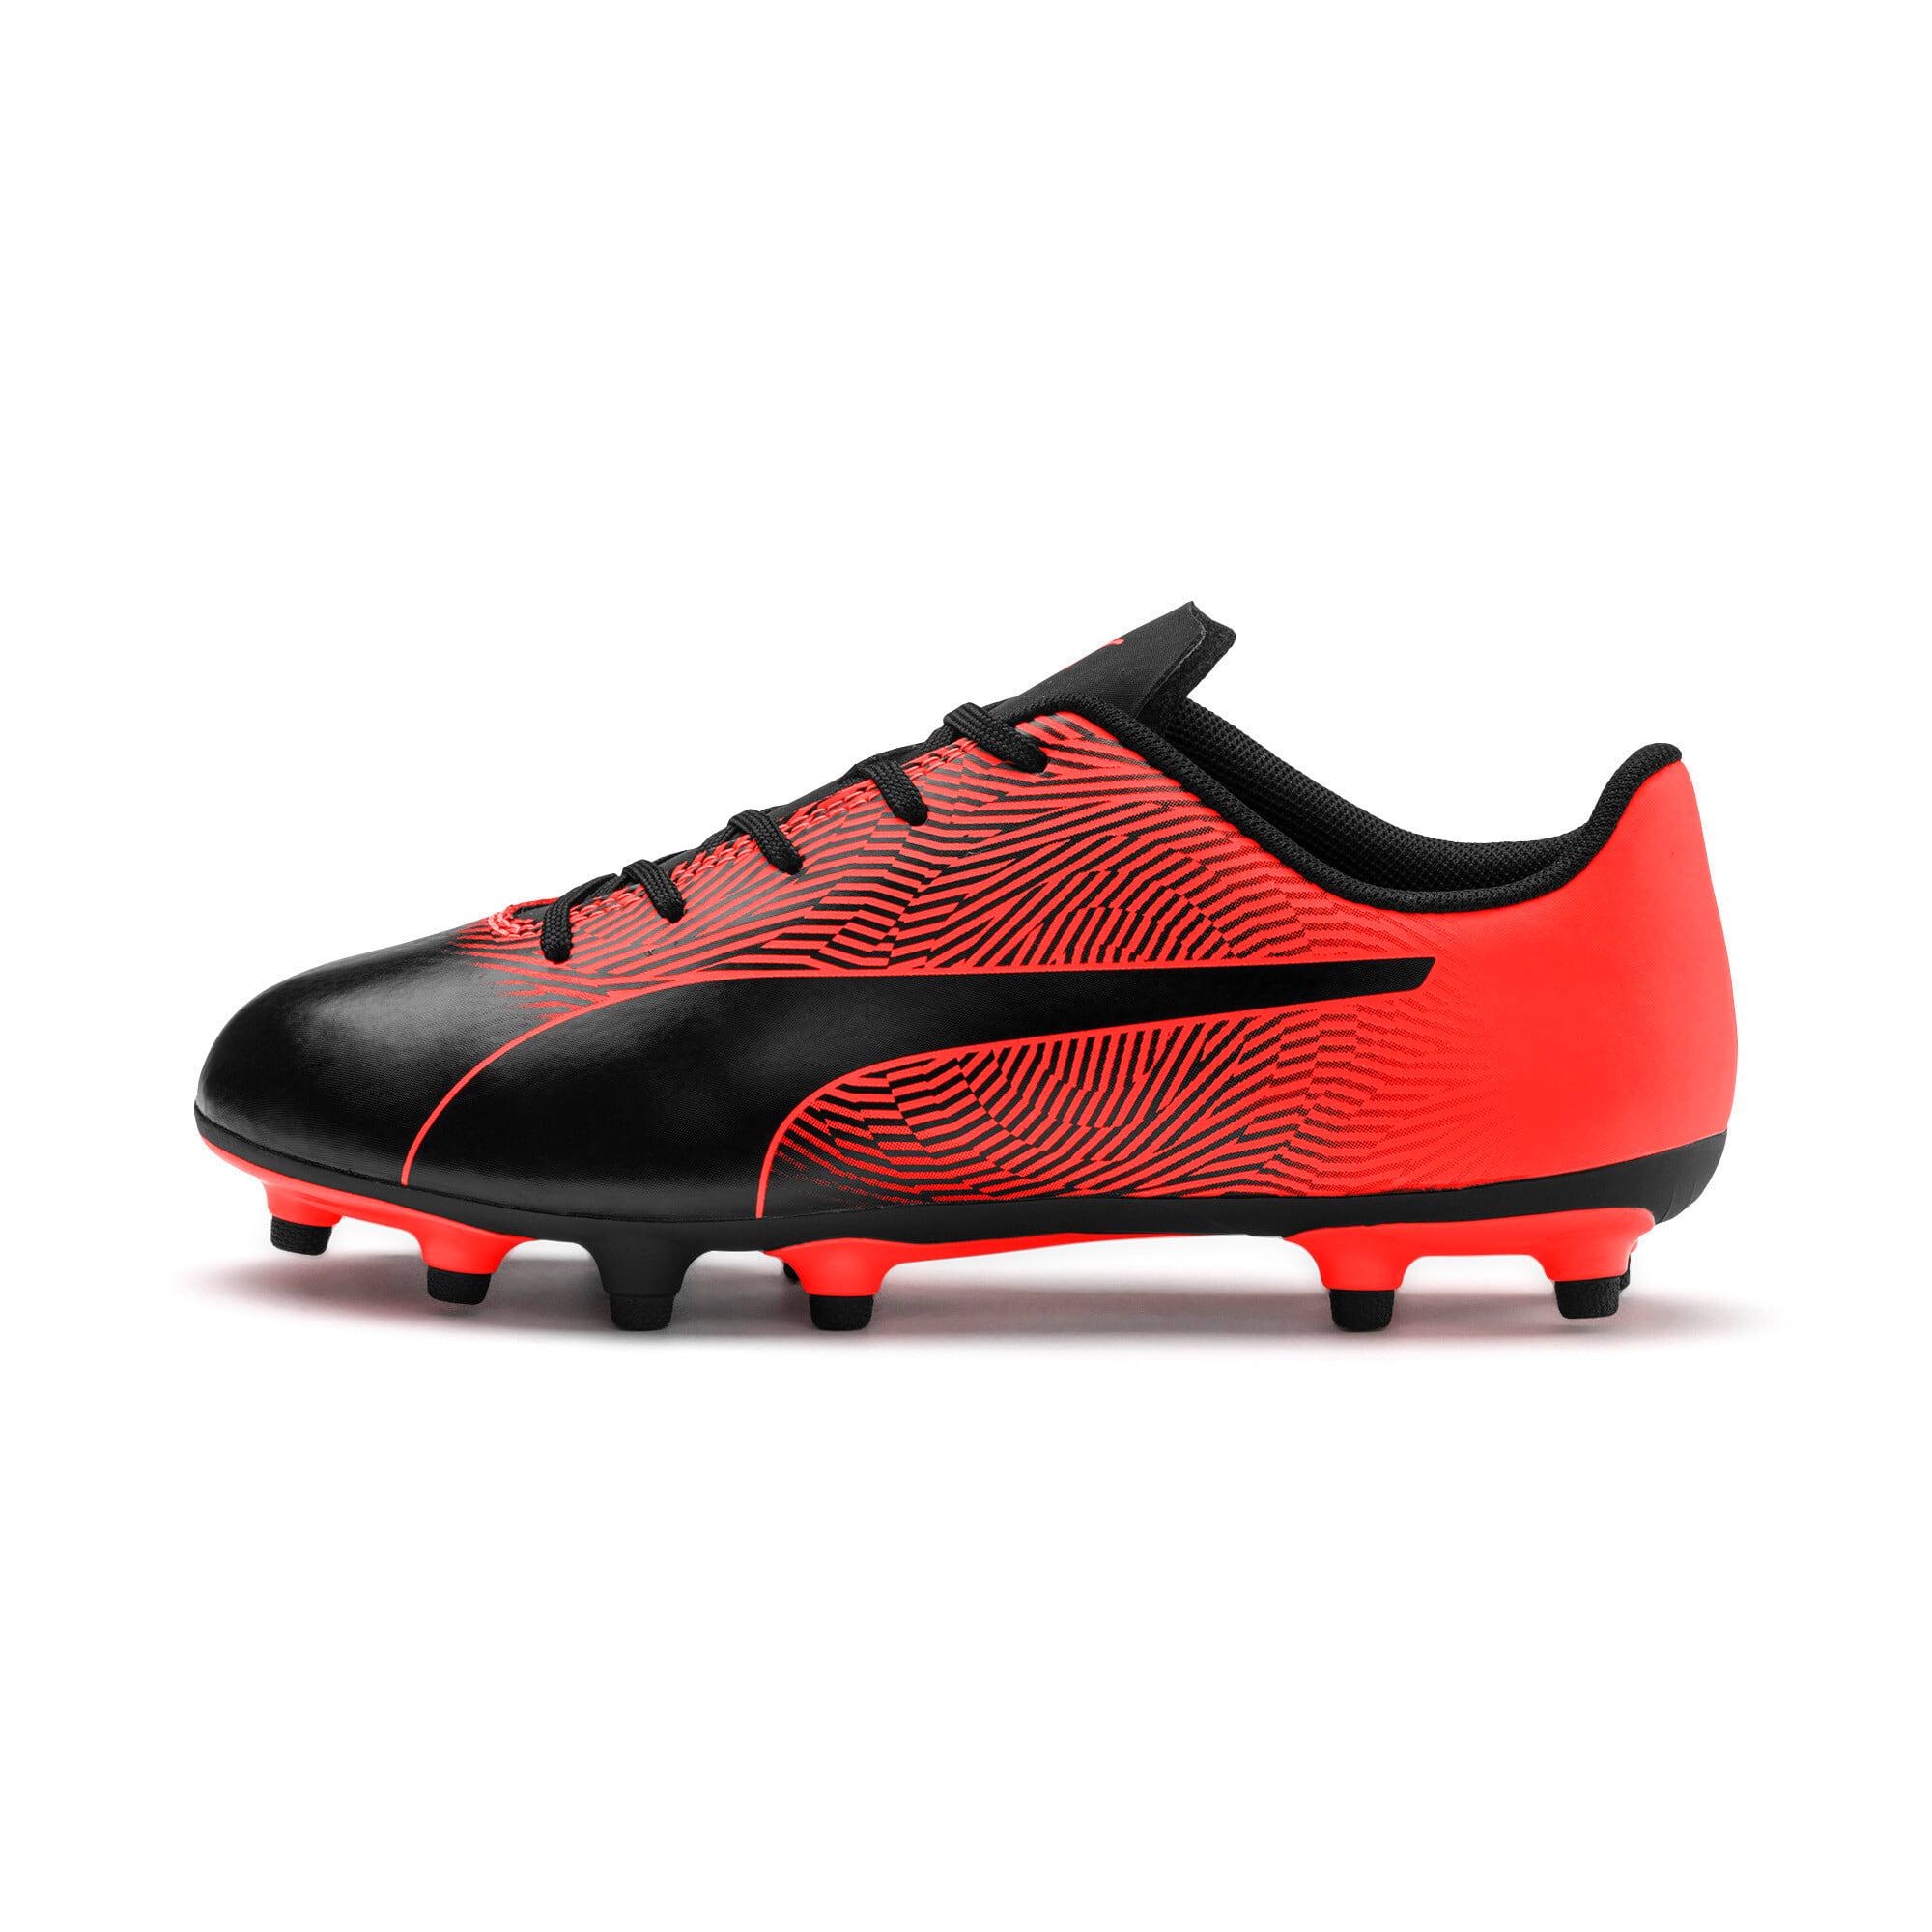 Thumbnail 1 of PUMA Spirit II FG Youth Football Boots, Puma Black-Nrgy Red, medium-IND